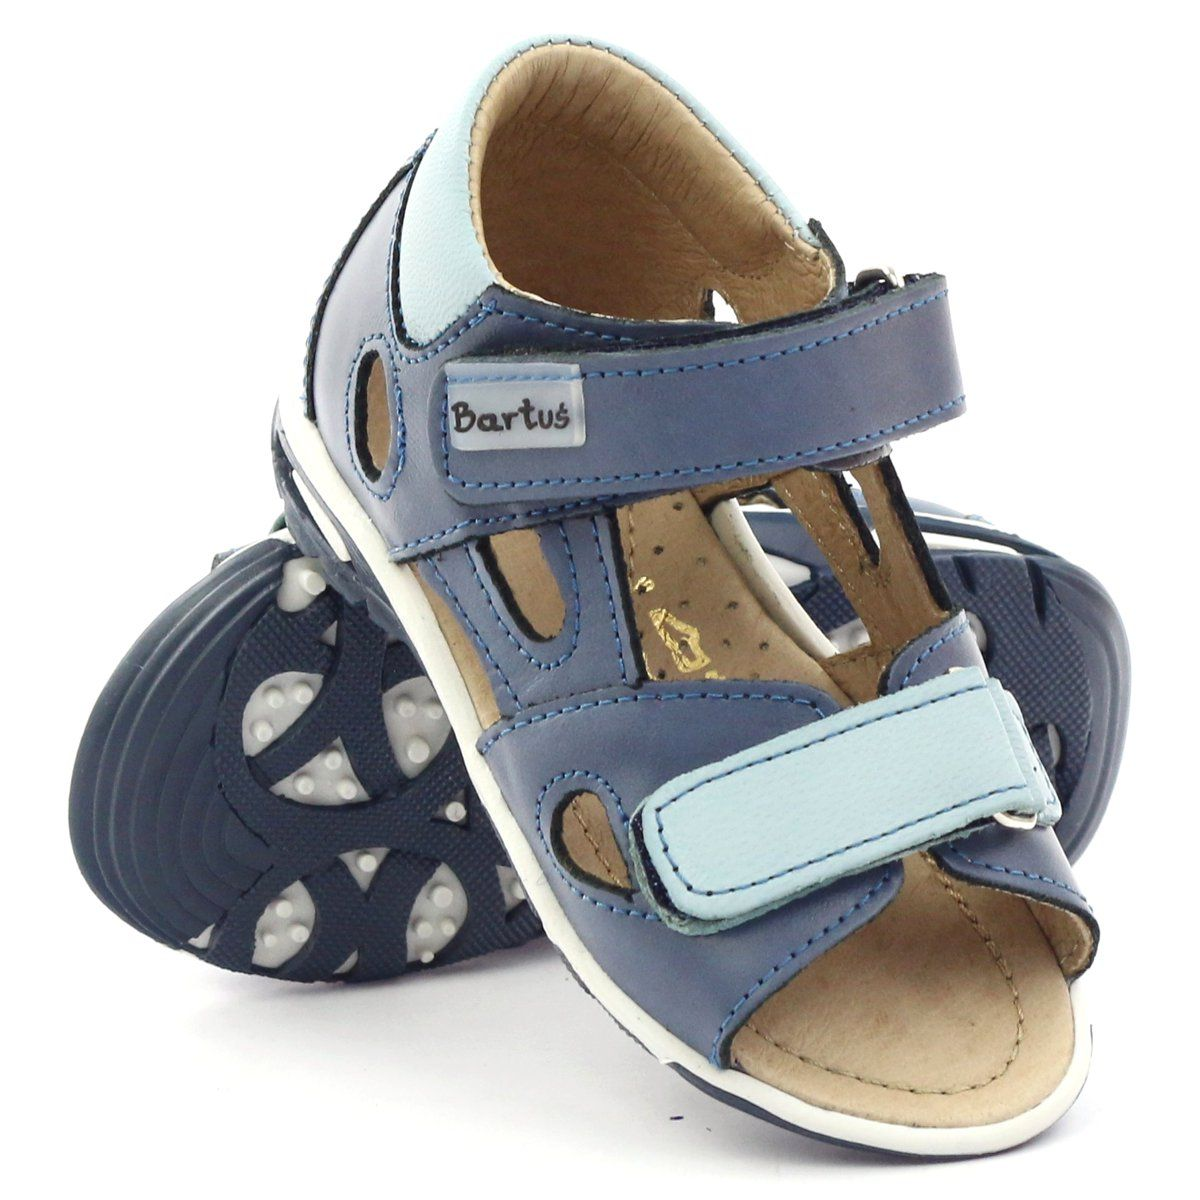 Sandalki Chlopiece Rzepy Bartus Niebieskie Baby Shoes Boys Sandals Shoes